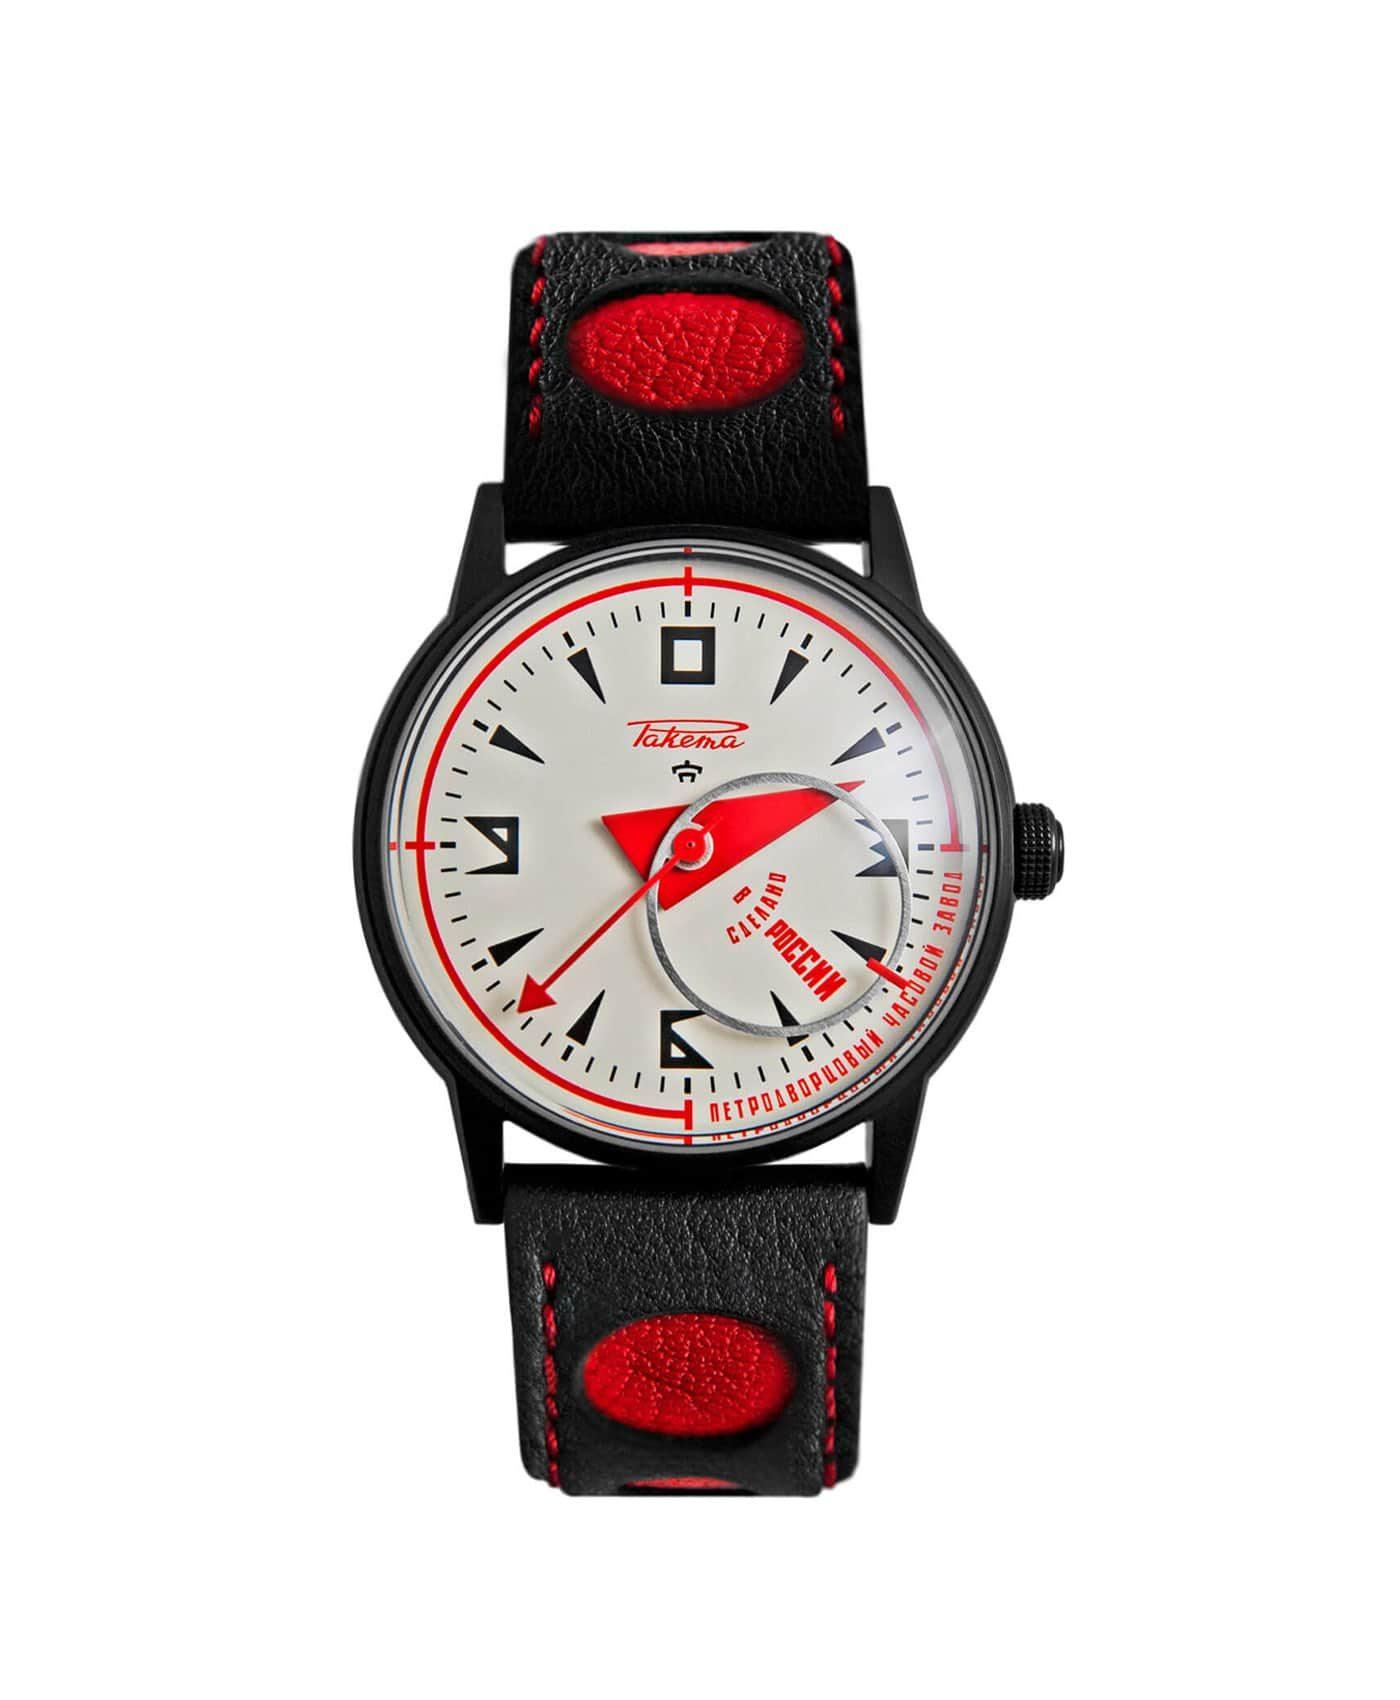 "RAKETA ""AVANT-GARDE"" 0279 watch dial front-min"